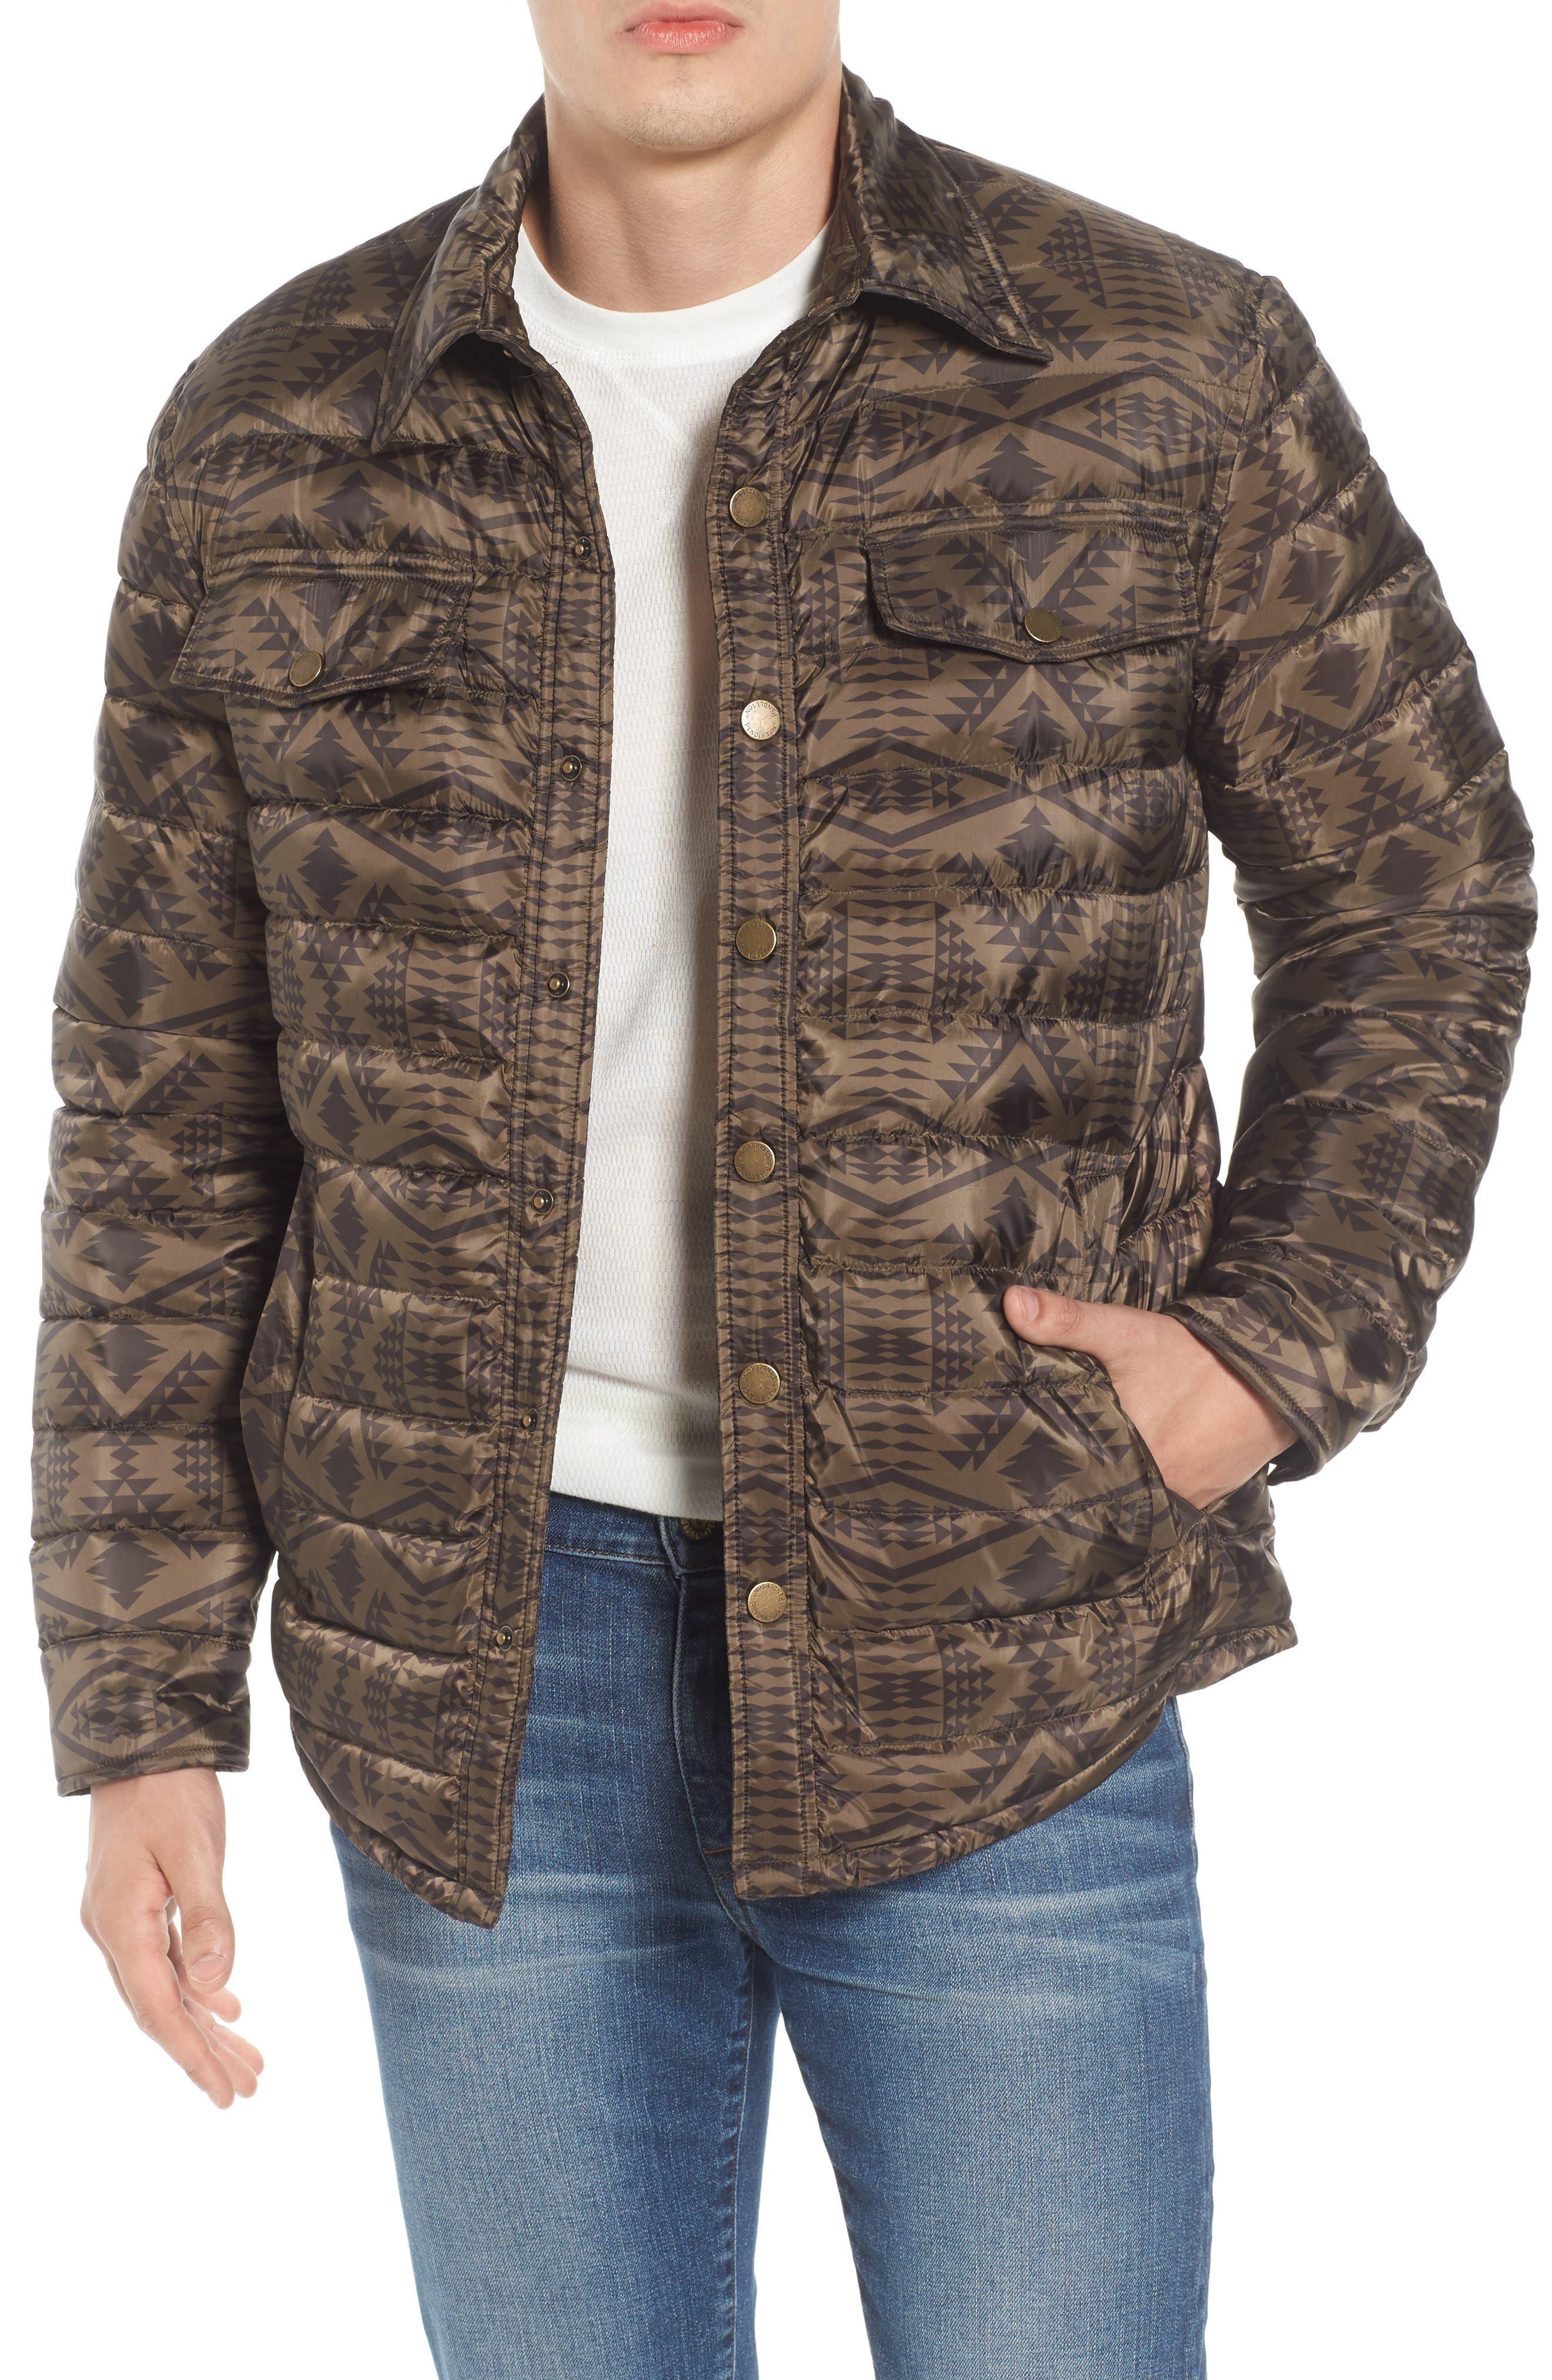 Main Image - Pendleton Moab Water Resistant Down Shirt Jacket